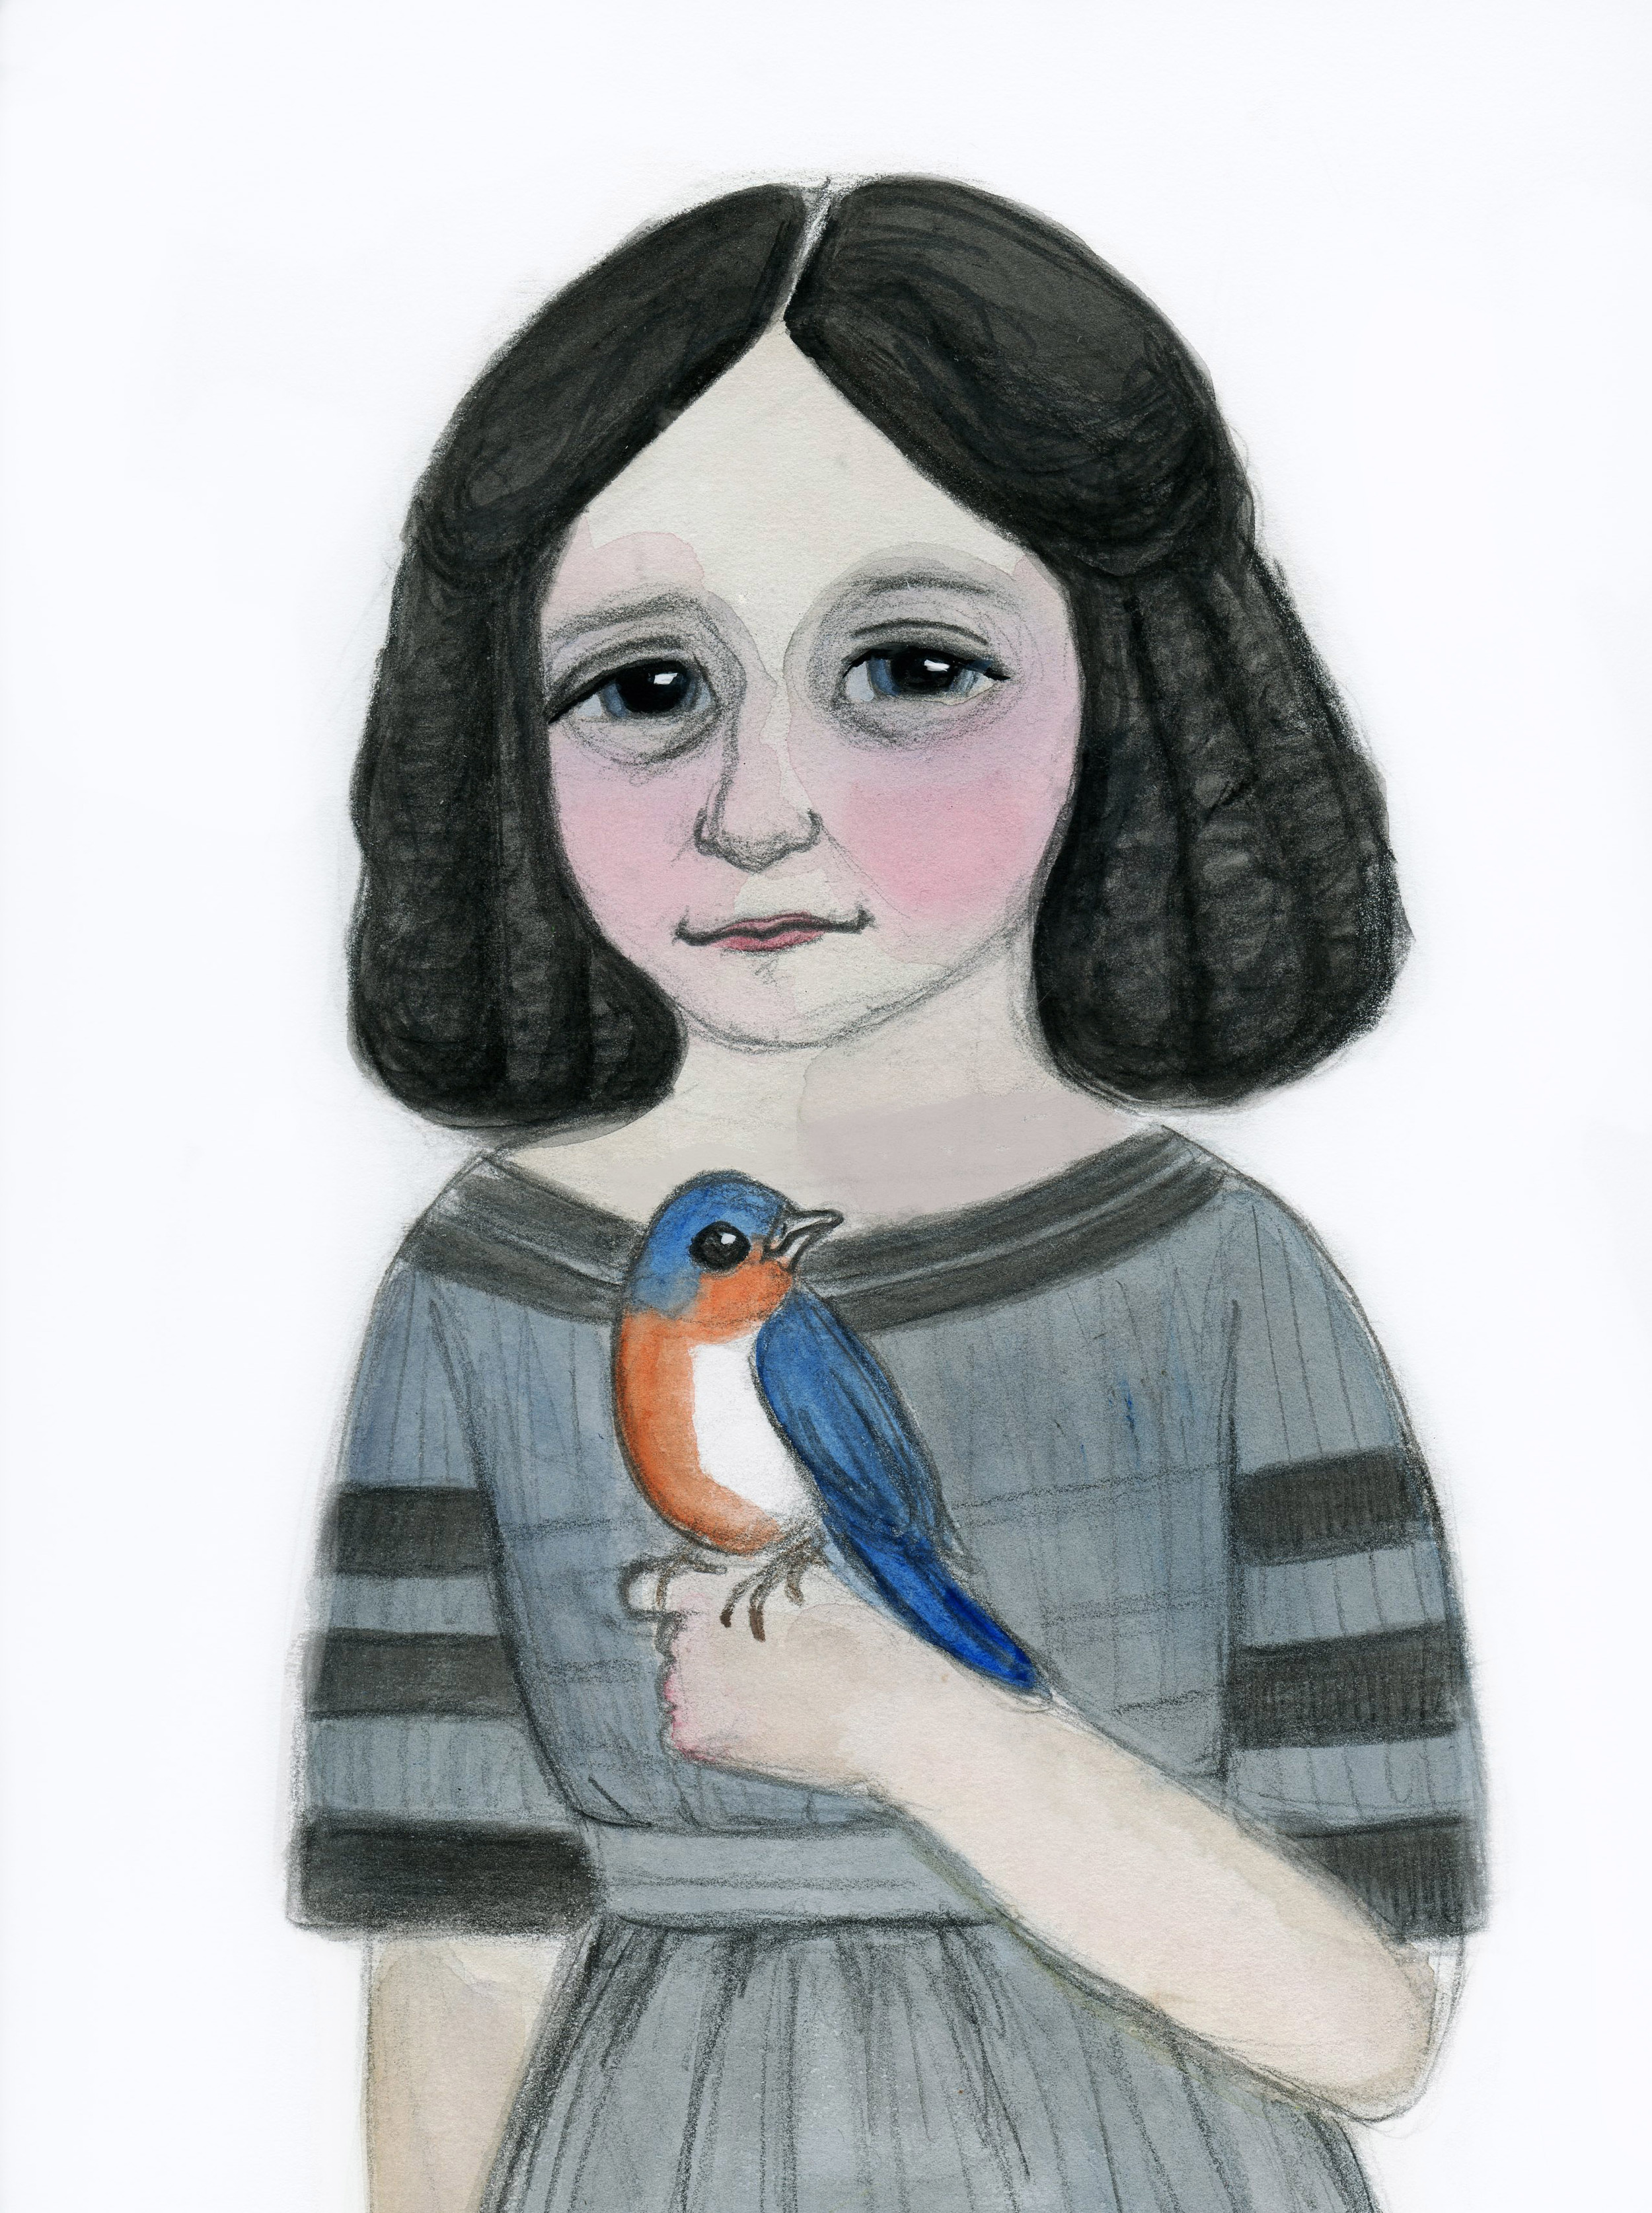 Edwina and her Bluebird